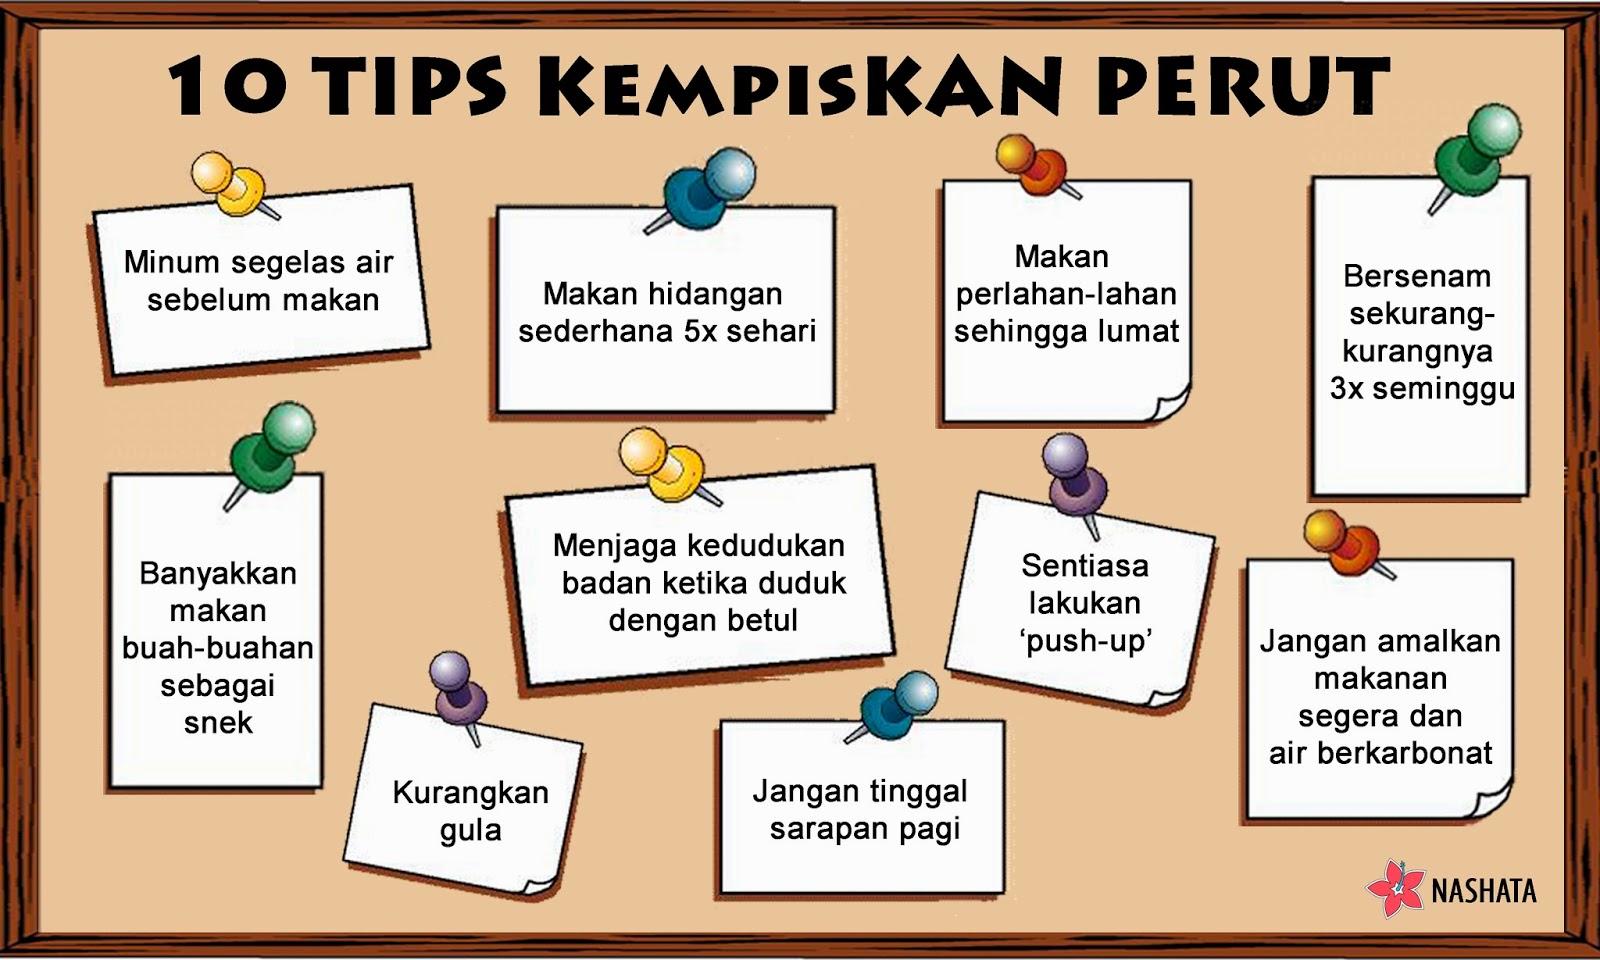 Cara Senaman Perut submited images.